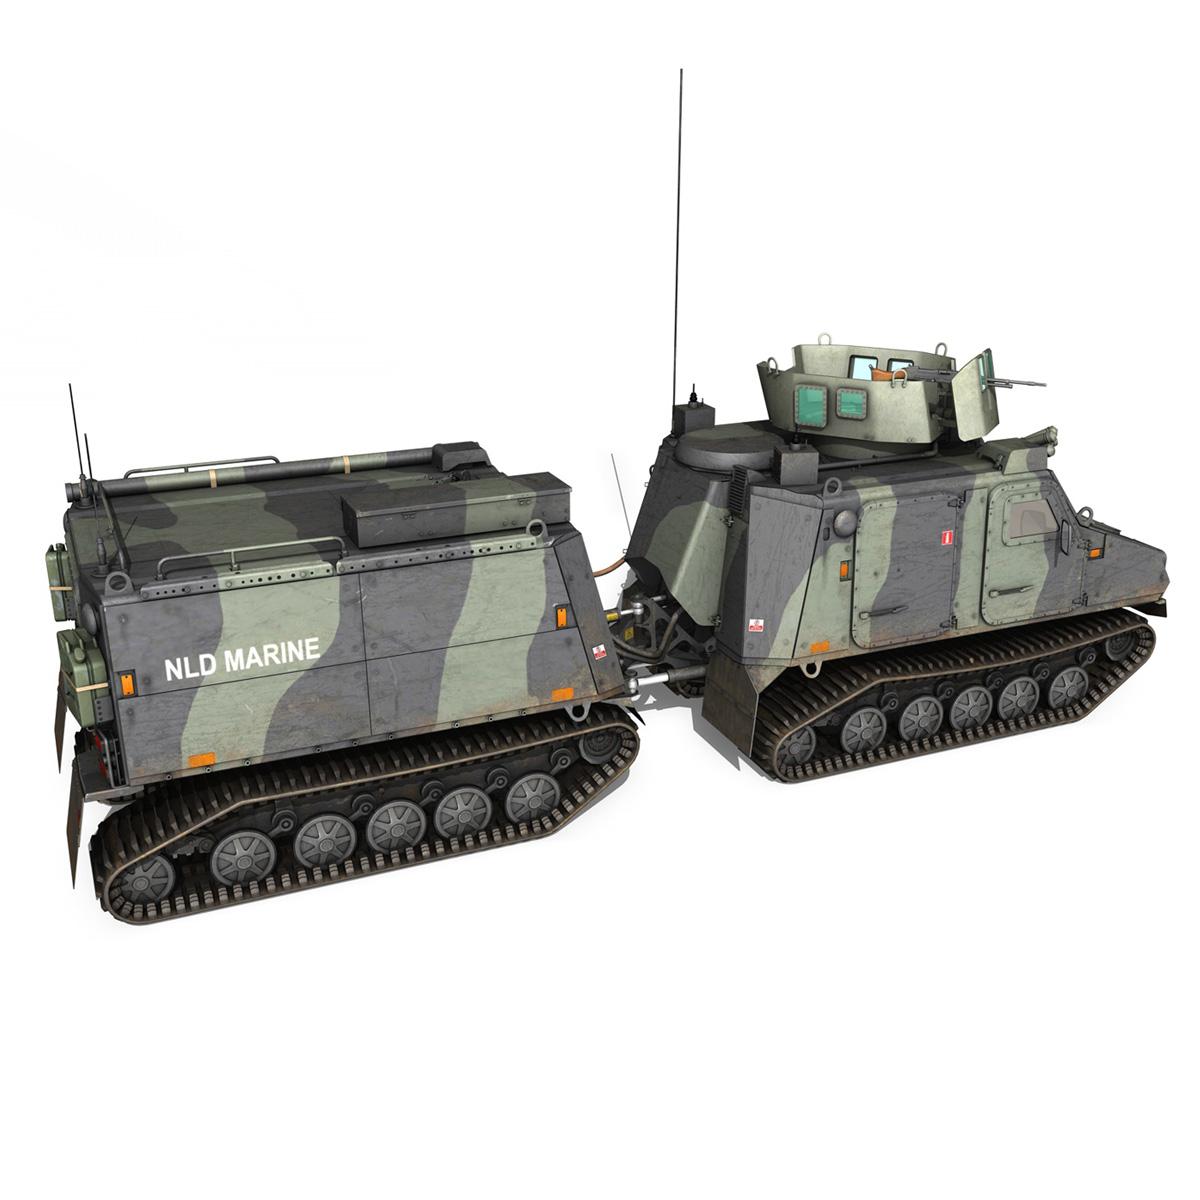 bvs10 viking – netherlands marine corps 3d model 3ds c4d lwo obj 293522